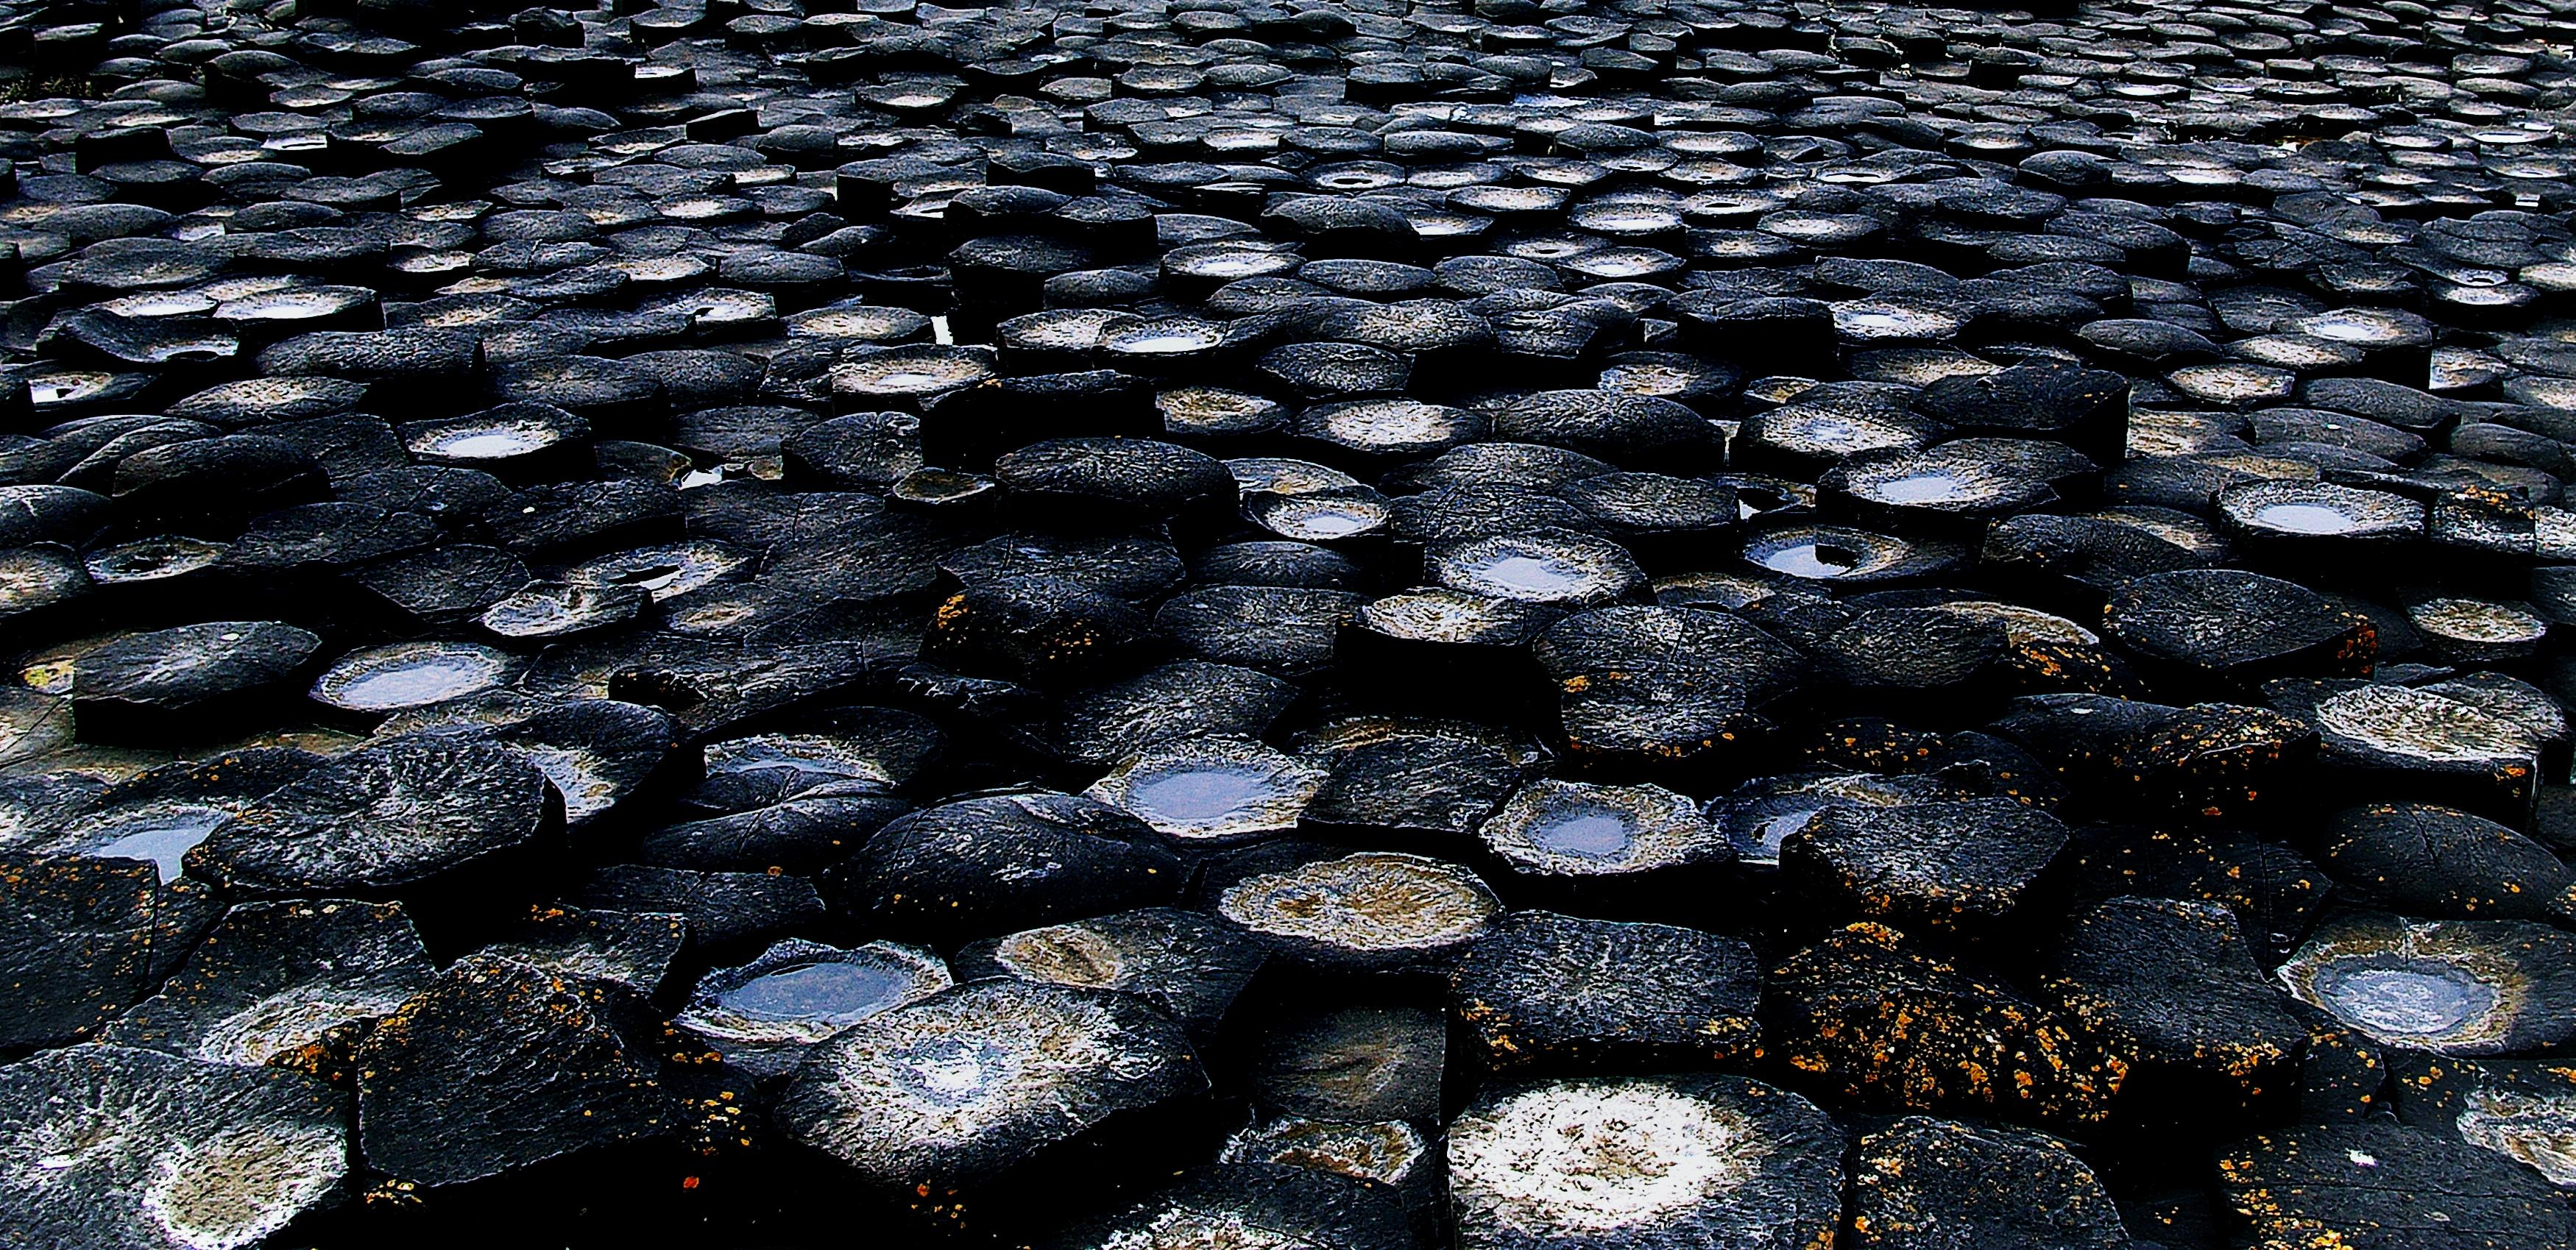 black and gray stones